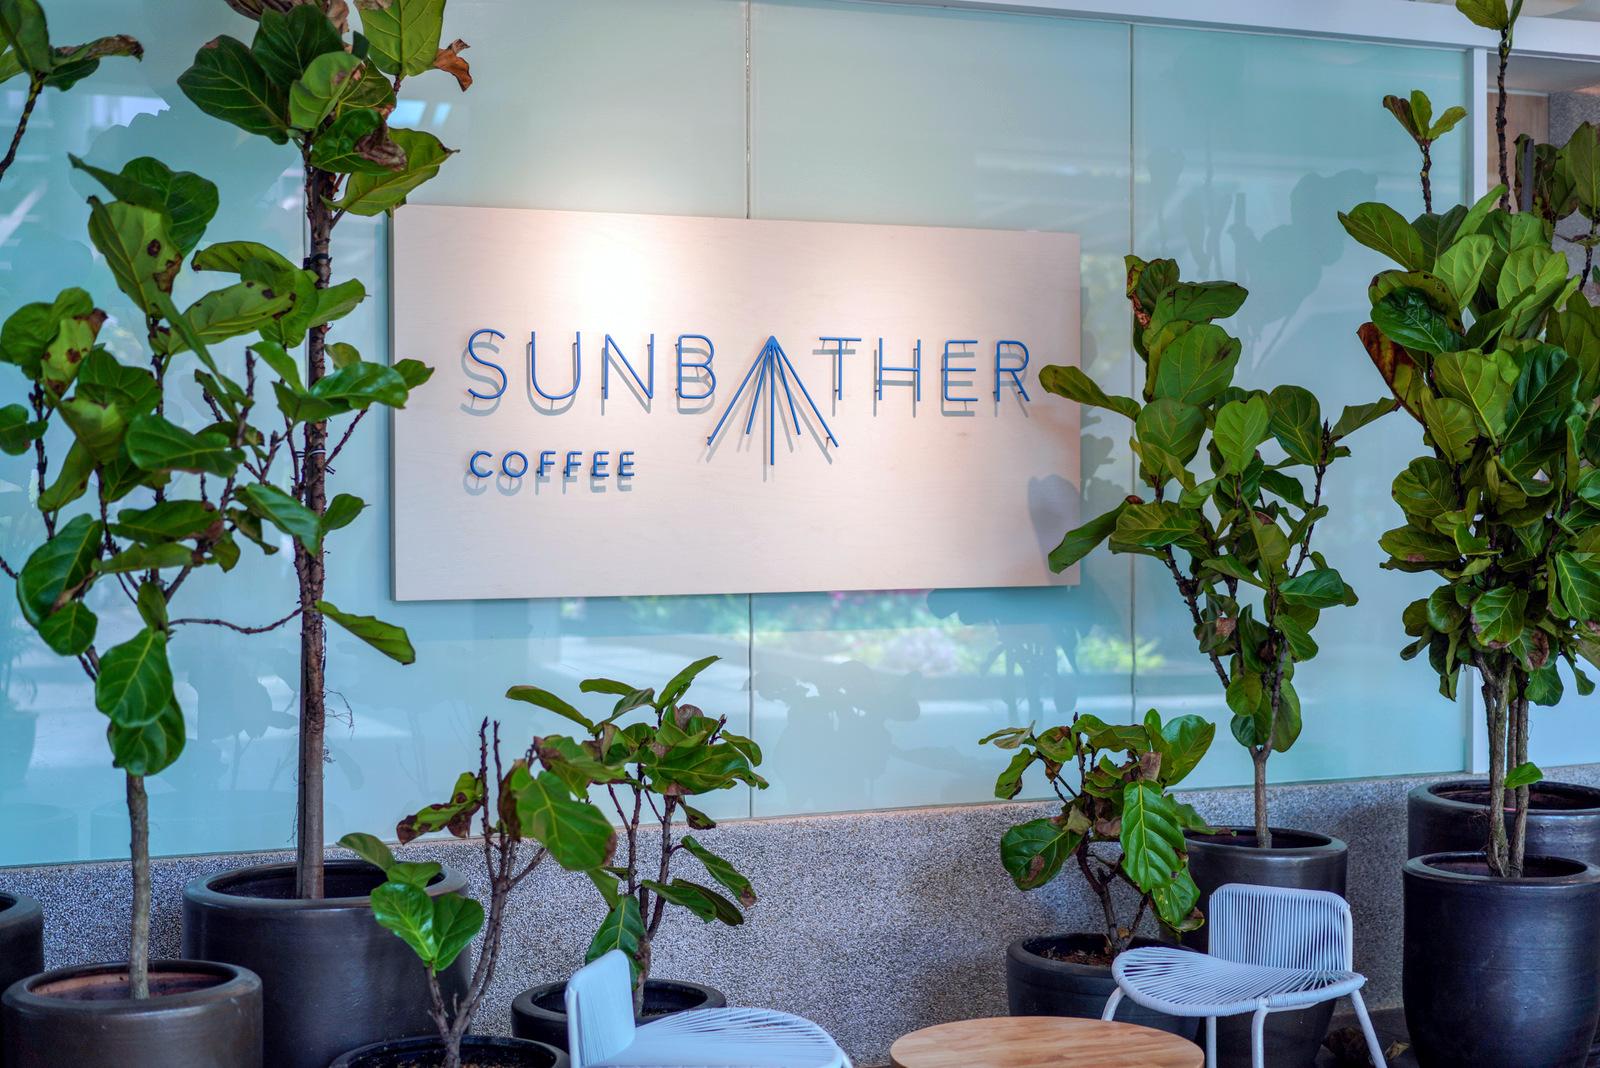 sunbather coffee, the sphere